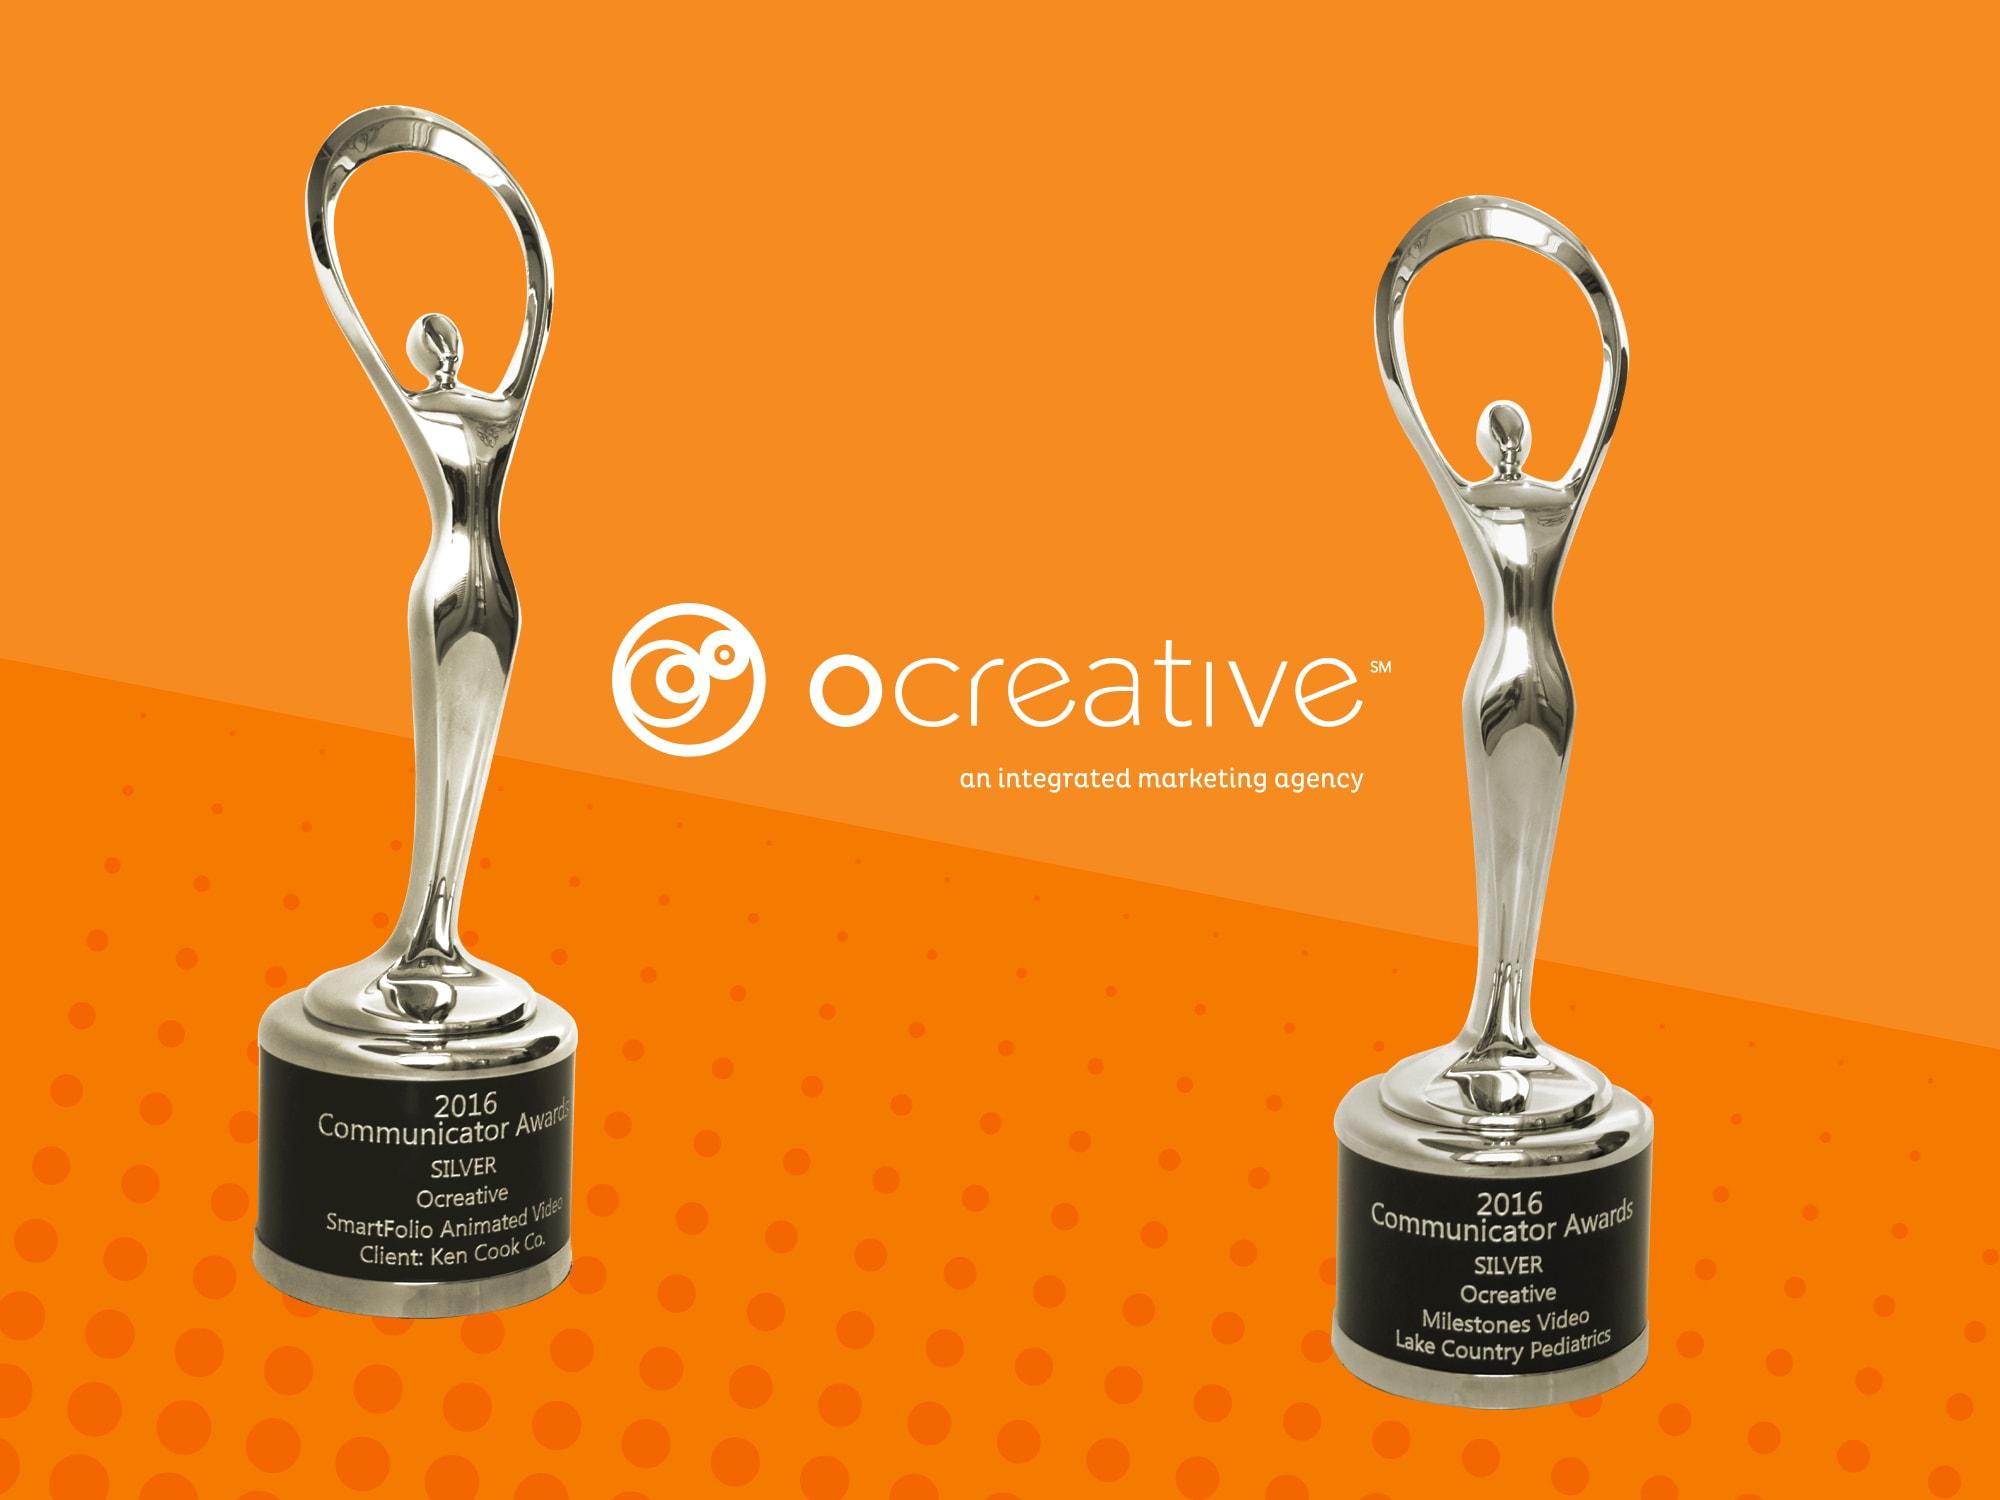 Ocreative - Award Winning Marketing Agency